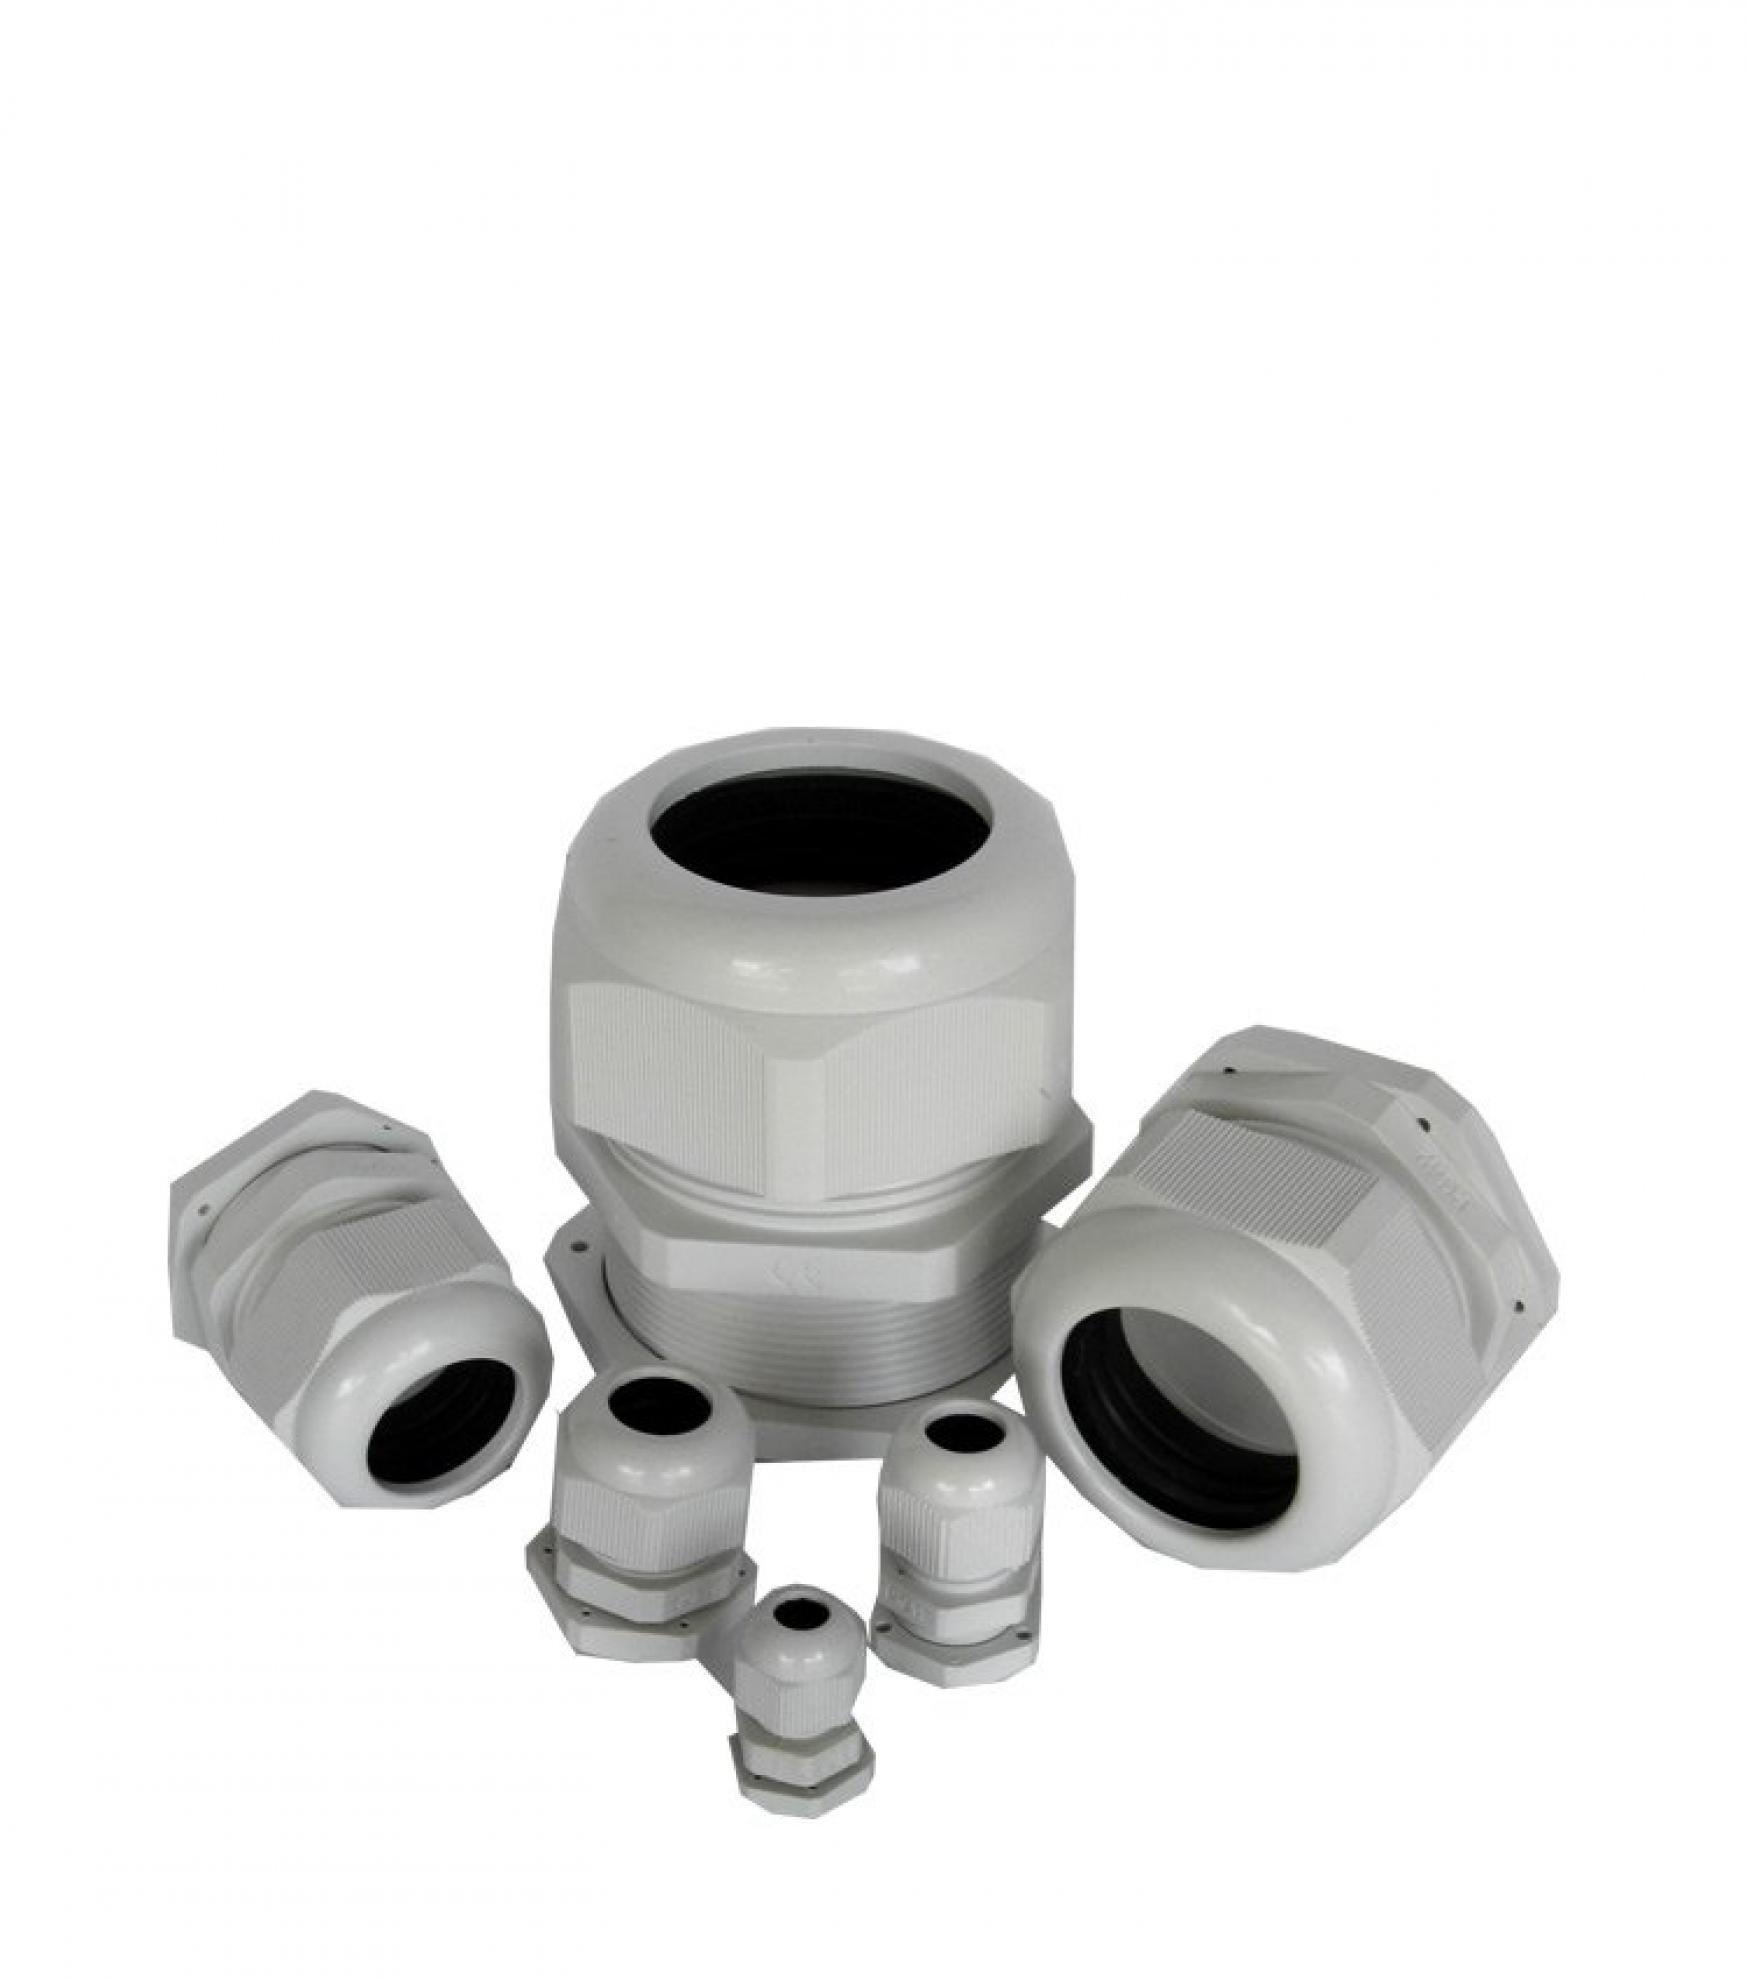 "PRENSA CABO  PVC CINZA 1. 1/4"""